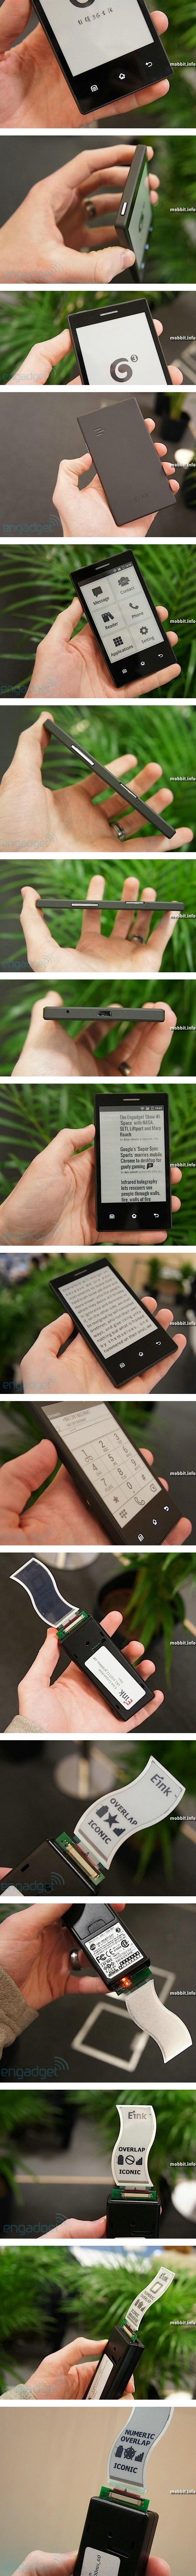 Смартфон с дисплеем из электронной бумаги от компании E Ink